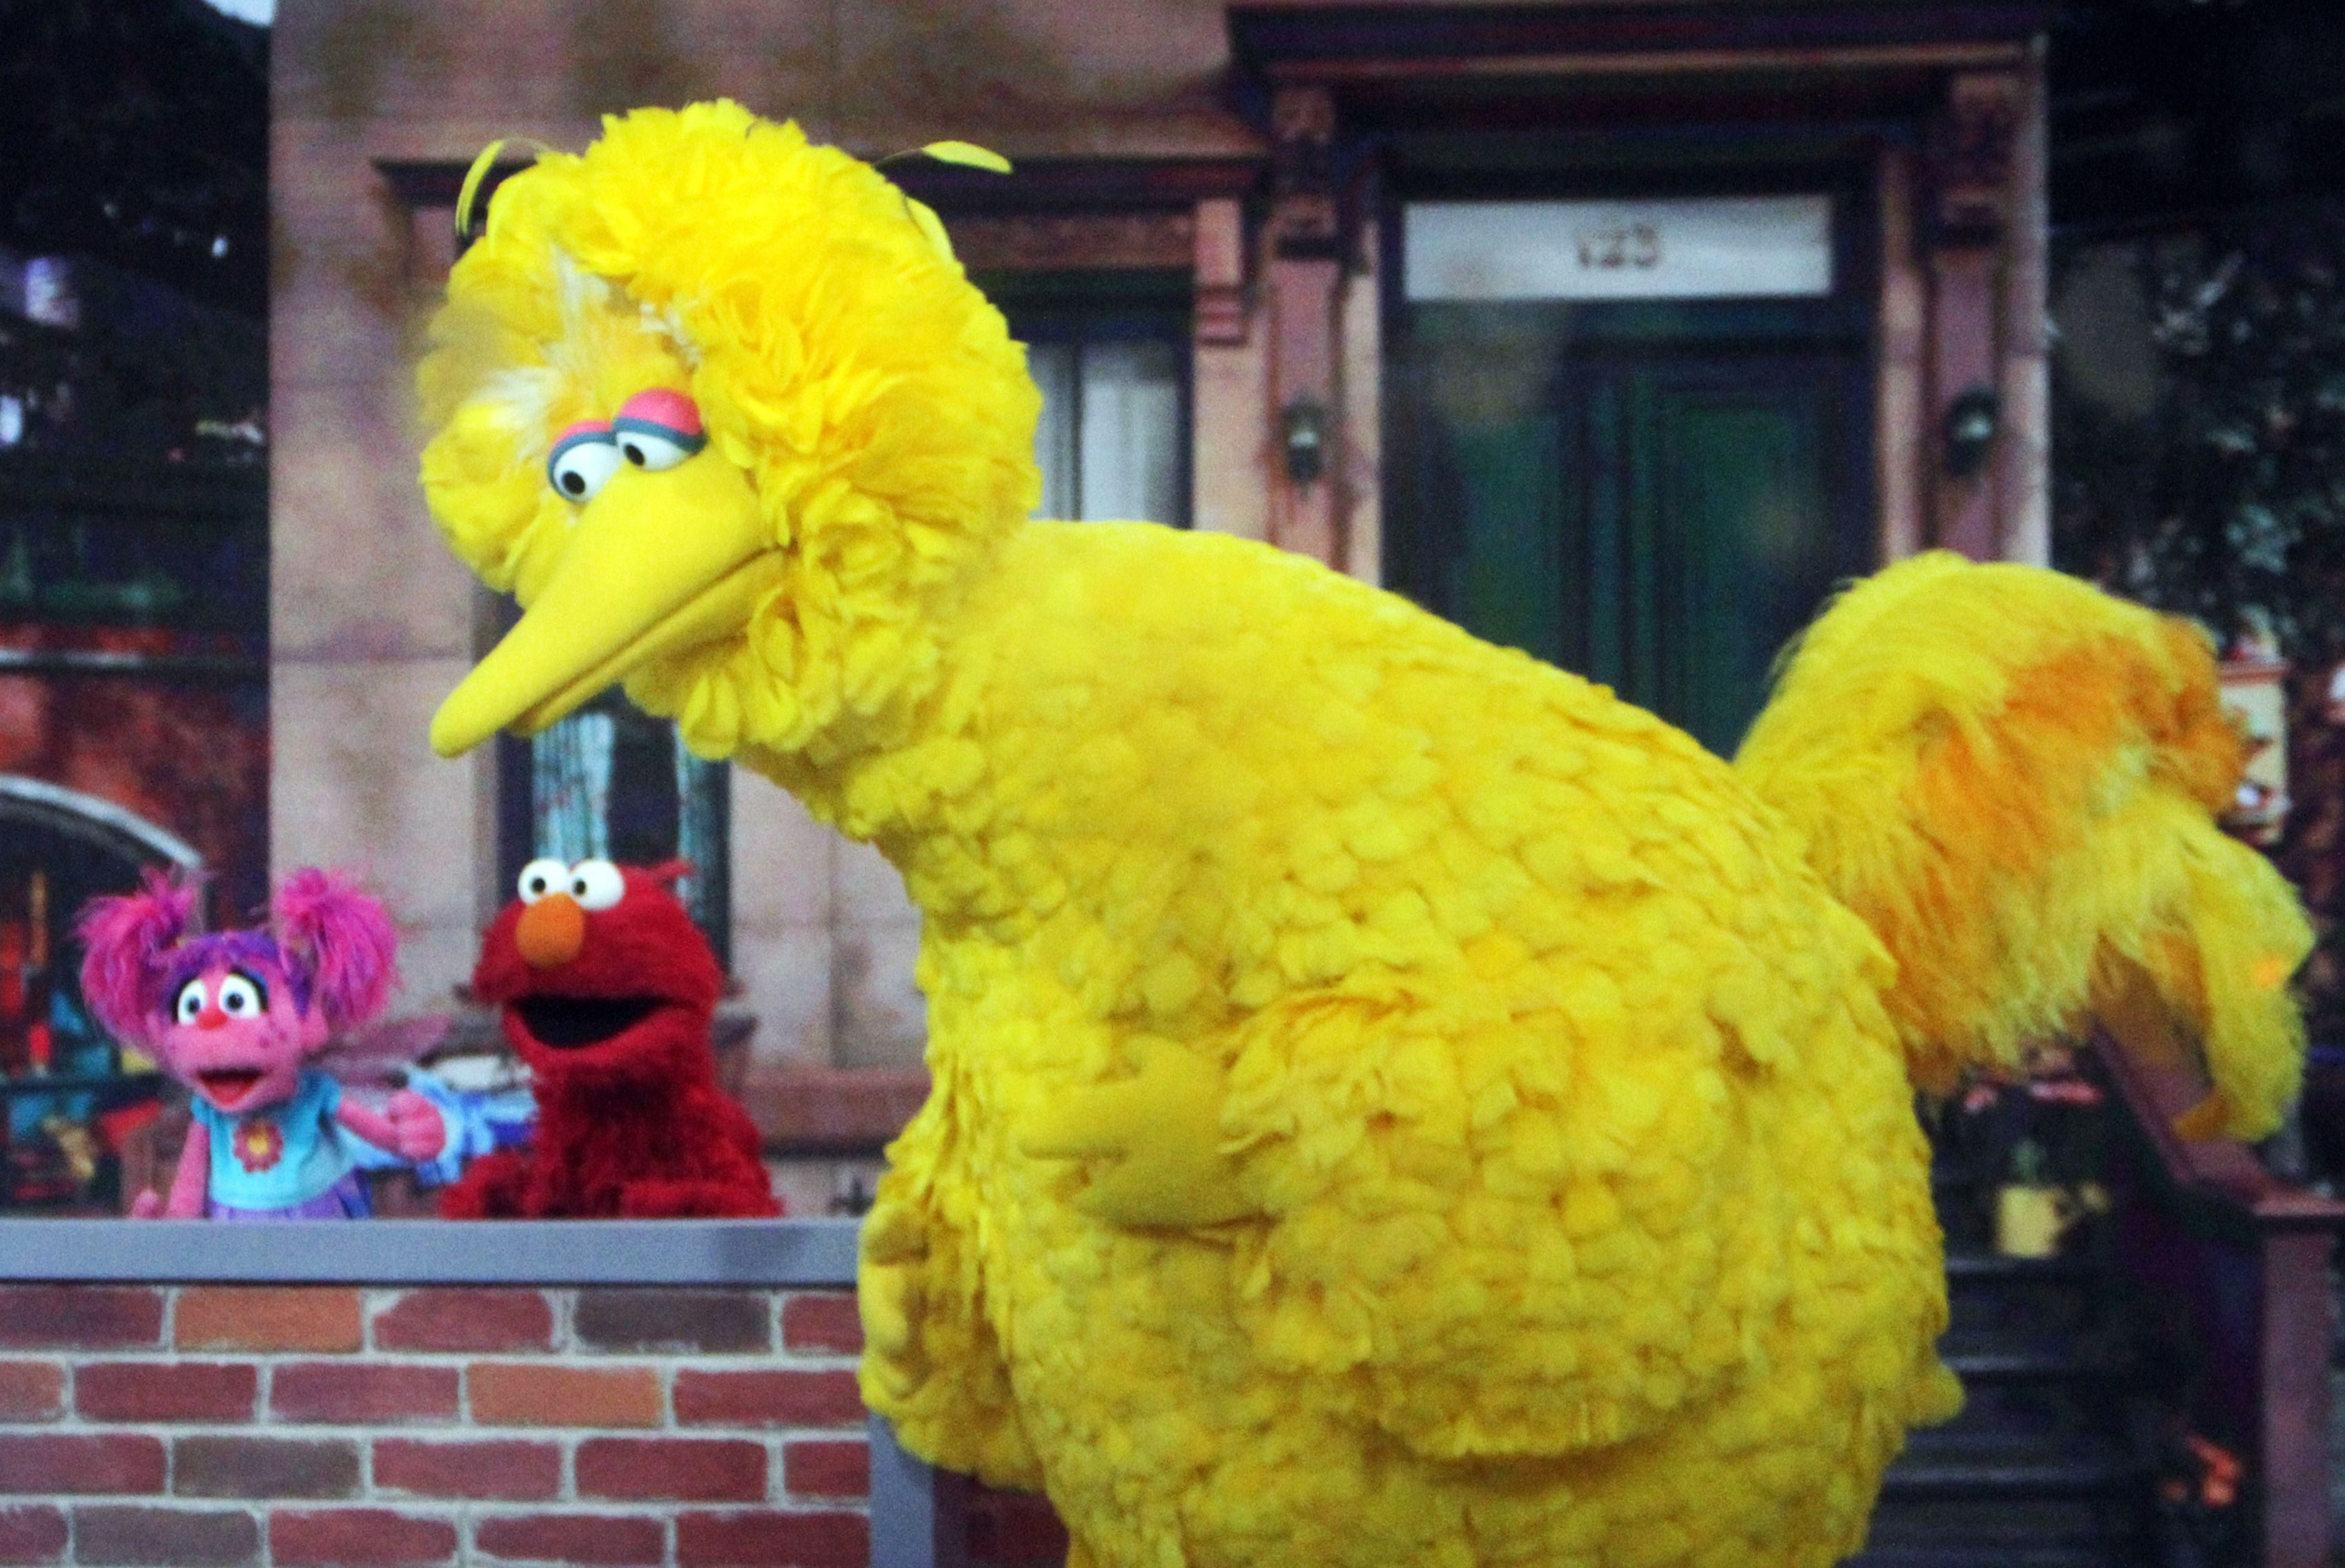 Mandatory Credit: Photo by MediaPunch/Shutterstock (9971118o) Abby Cadabby, Elmo and Big Bird 'Today' TV show, New York, USA - 08 Nov 2018